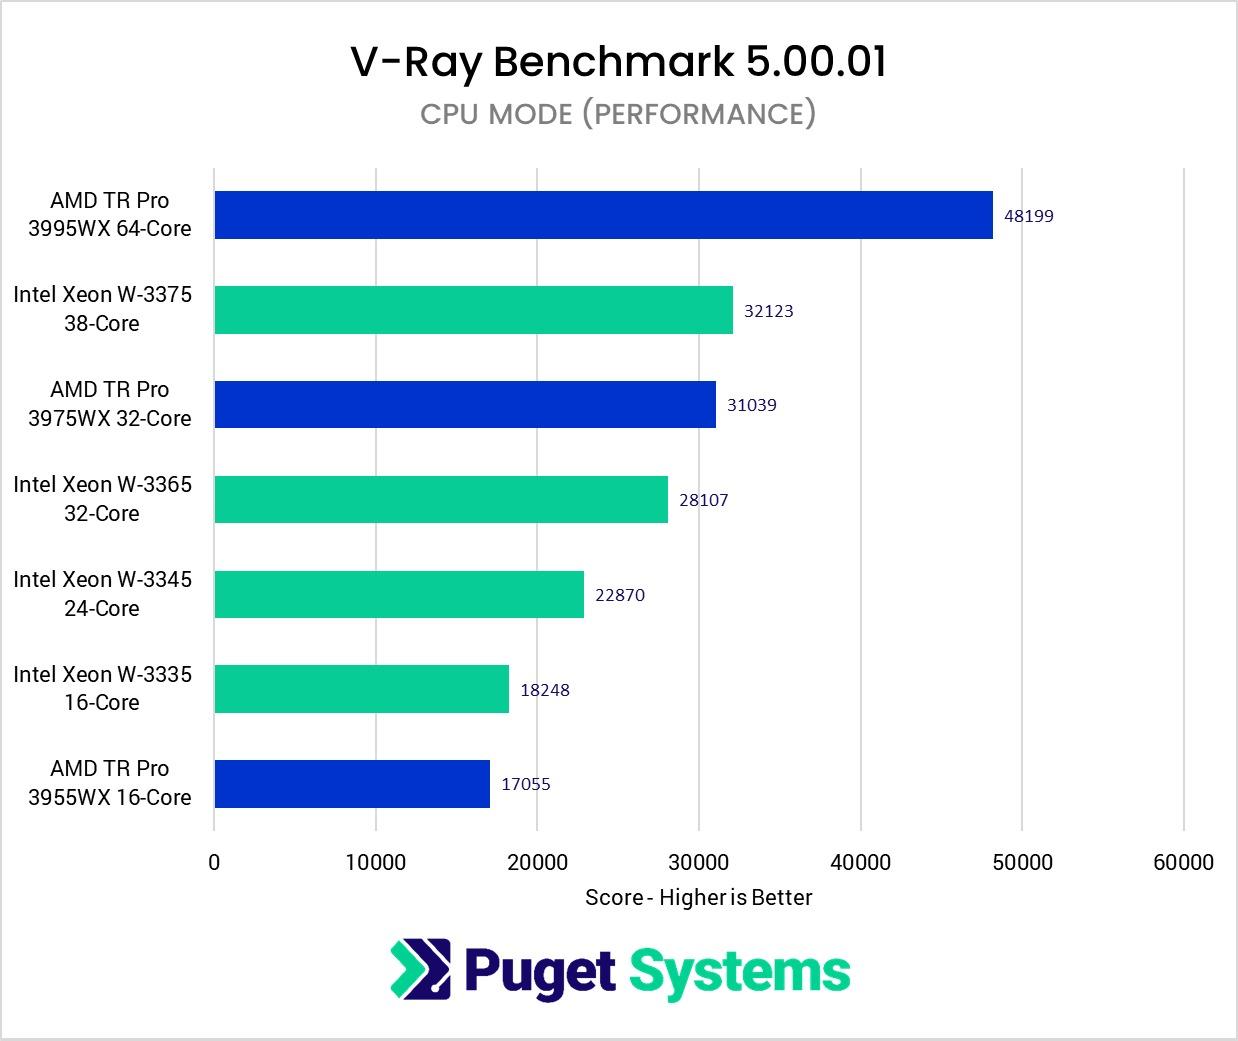 intel-xeon-w-3300-vs-amd-threadripper-pro-workstation-cpu-benchmarks-high-perf-mode-_1